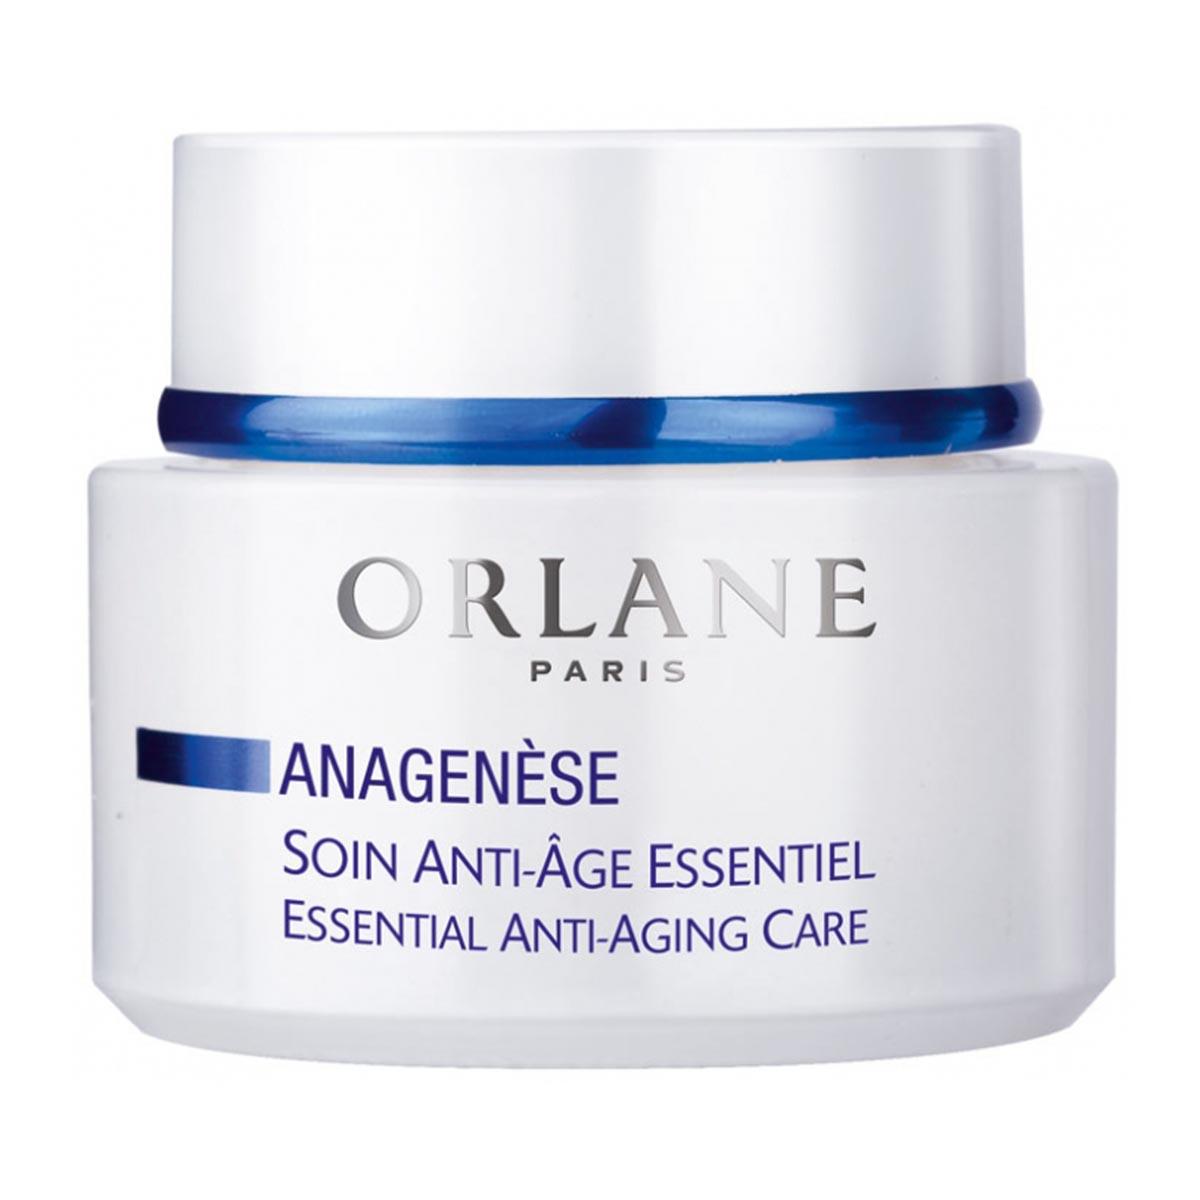 Orlane anagenese essential anti aging care 50ml